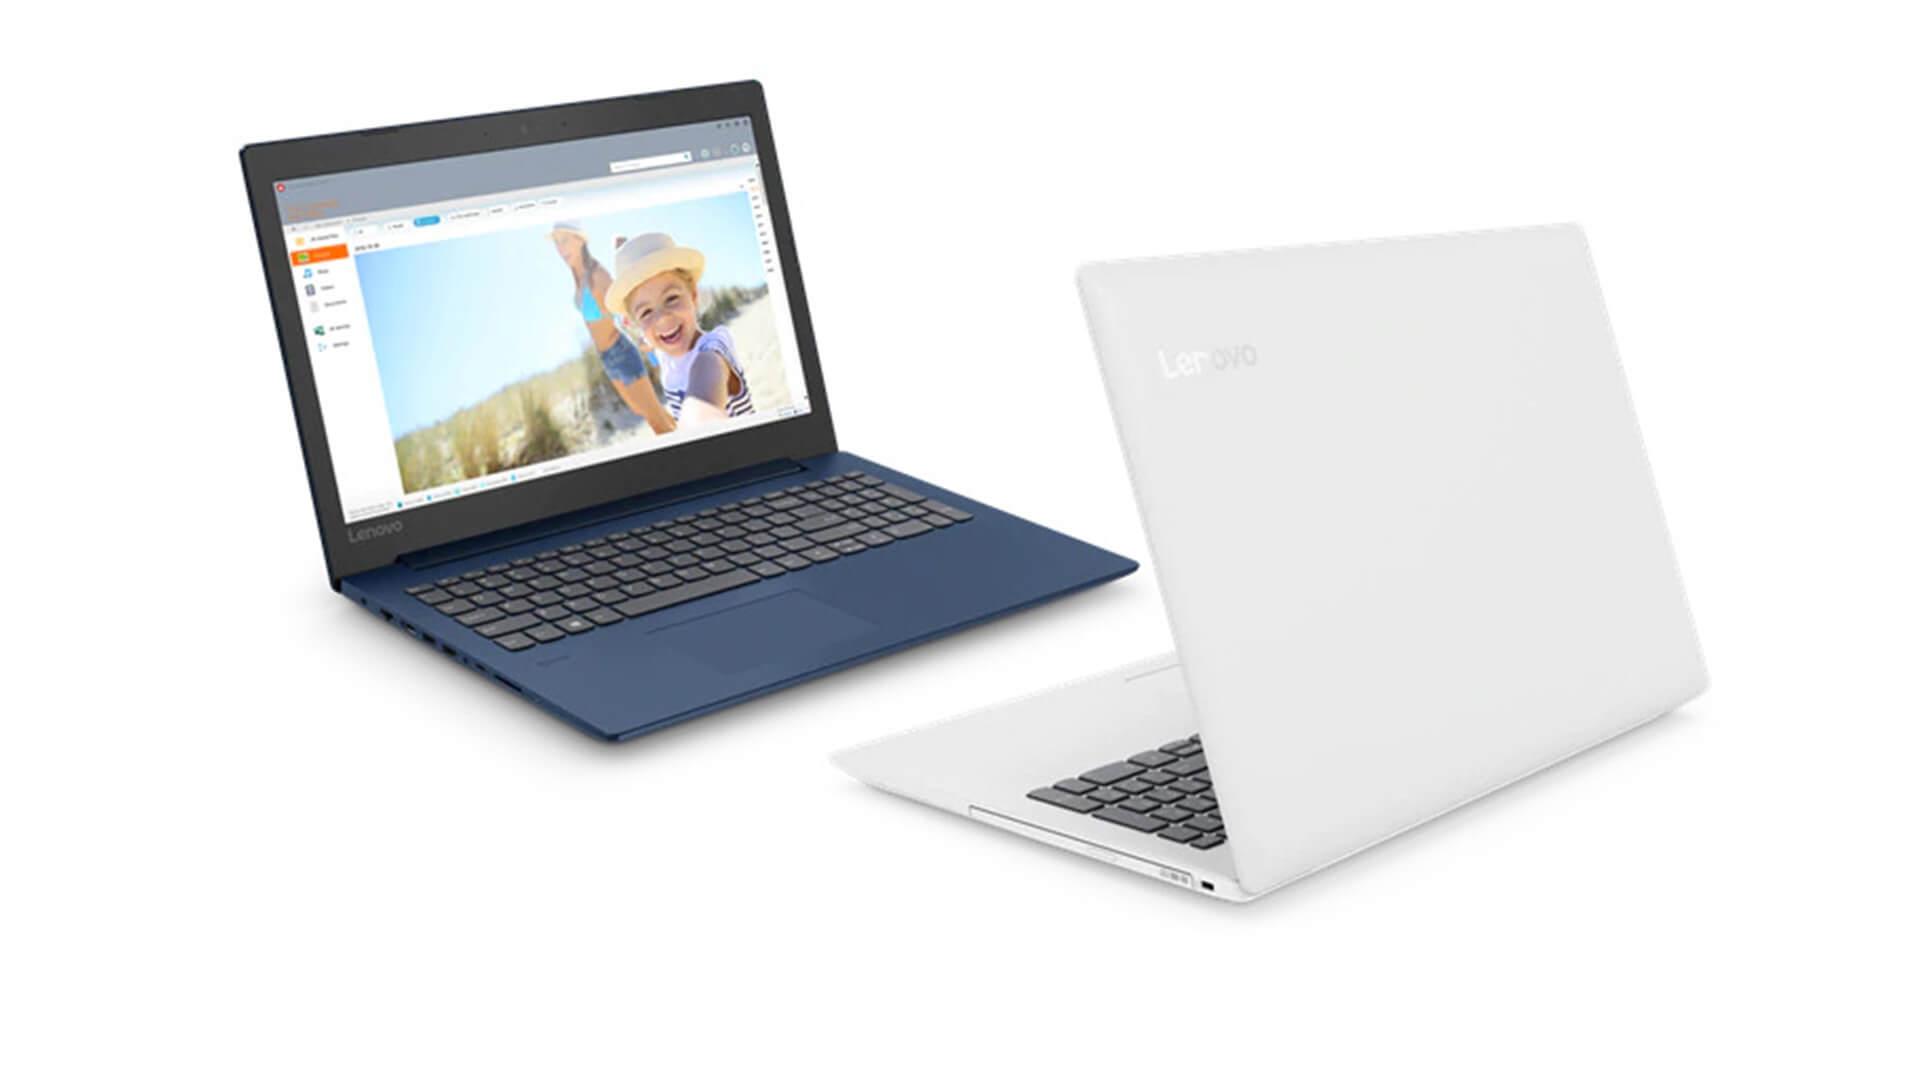 لپ تاپ لنوو Ideapad 330 - U